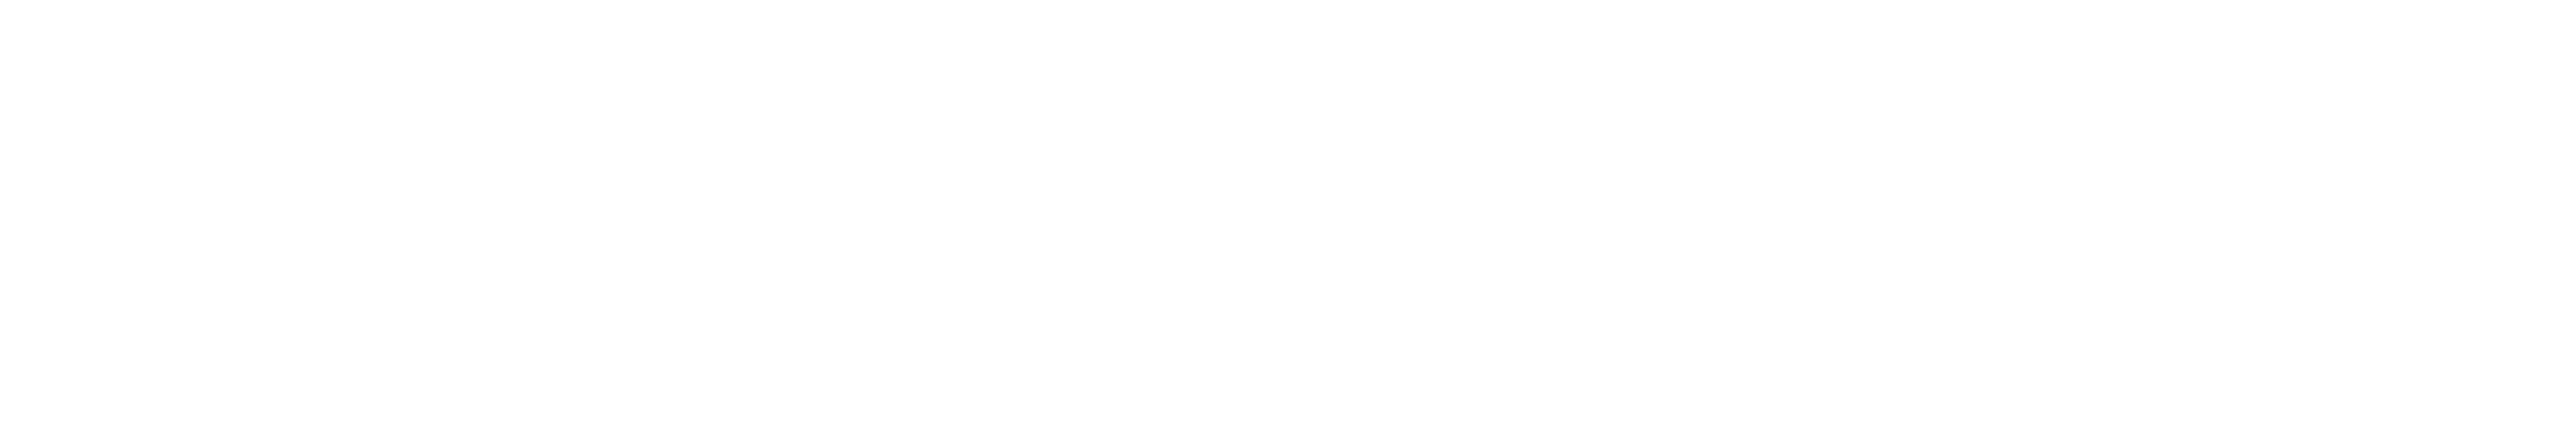 LARRYWILSON-WM-WHT